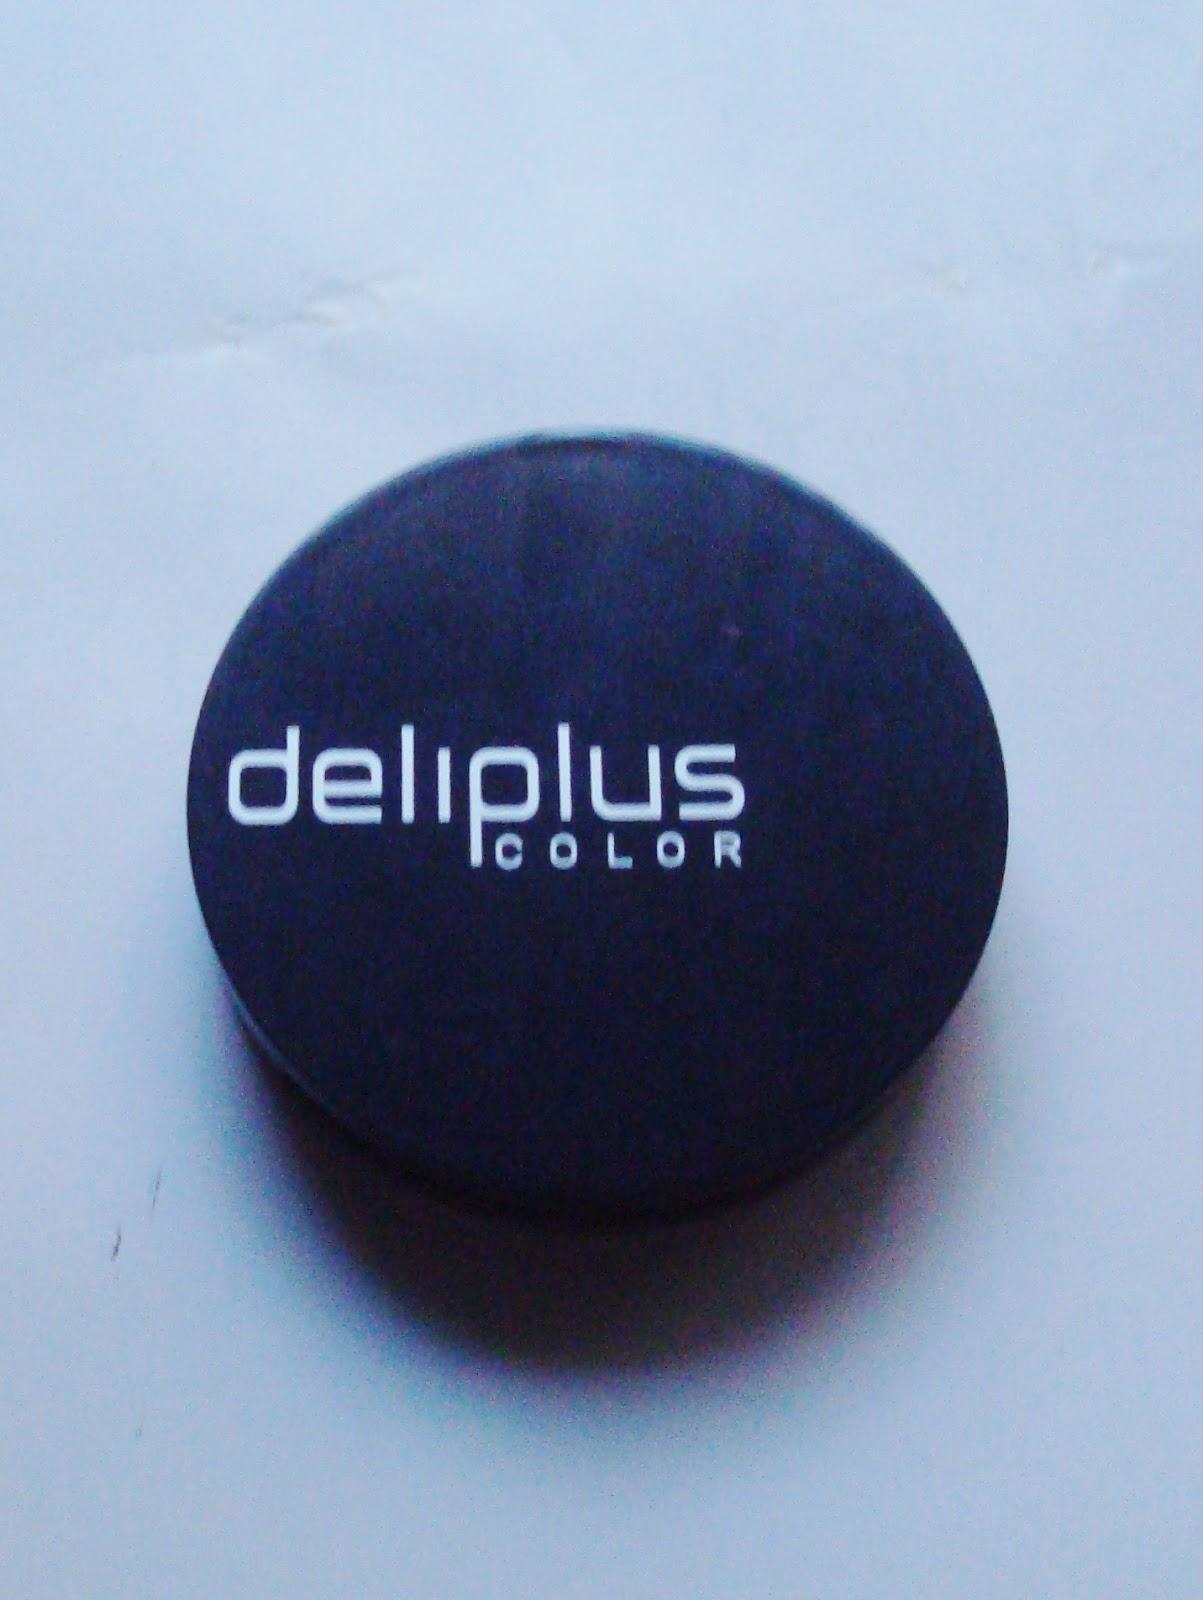 OnlyNess - Productos terminados bronzer deliplus